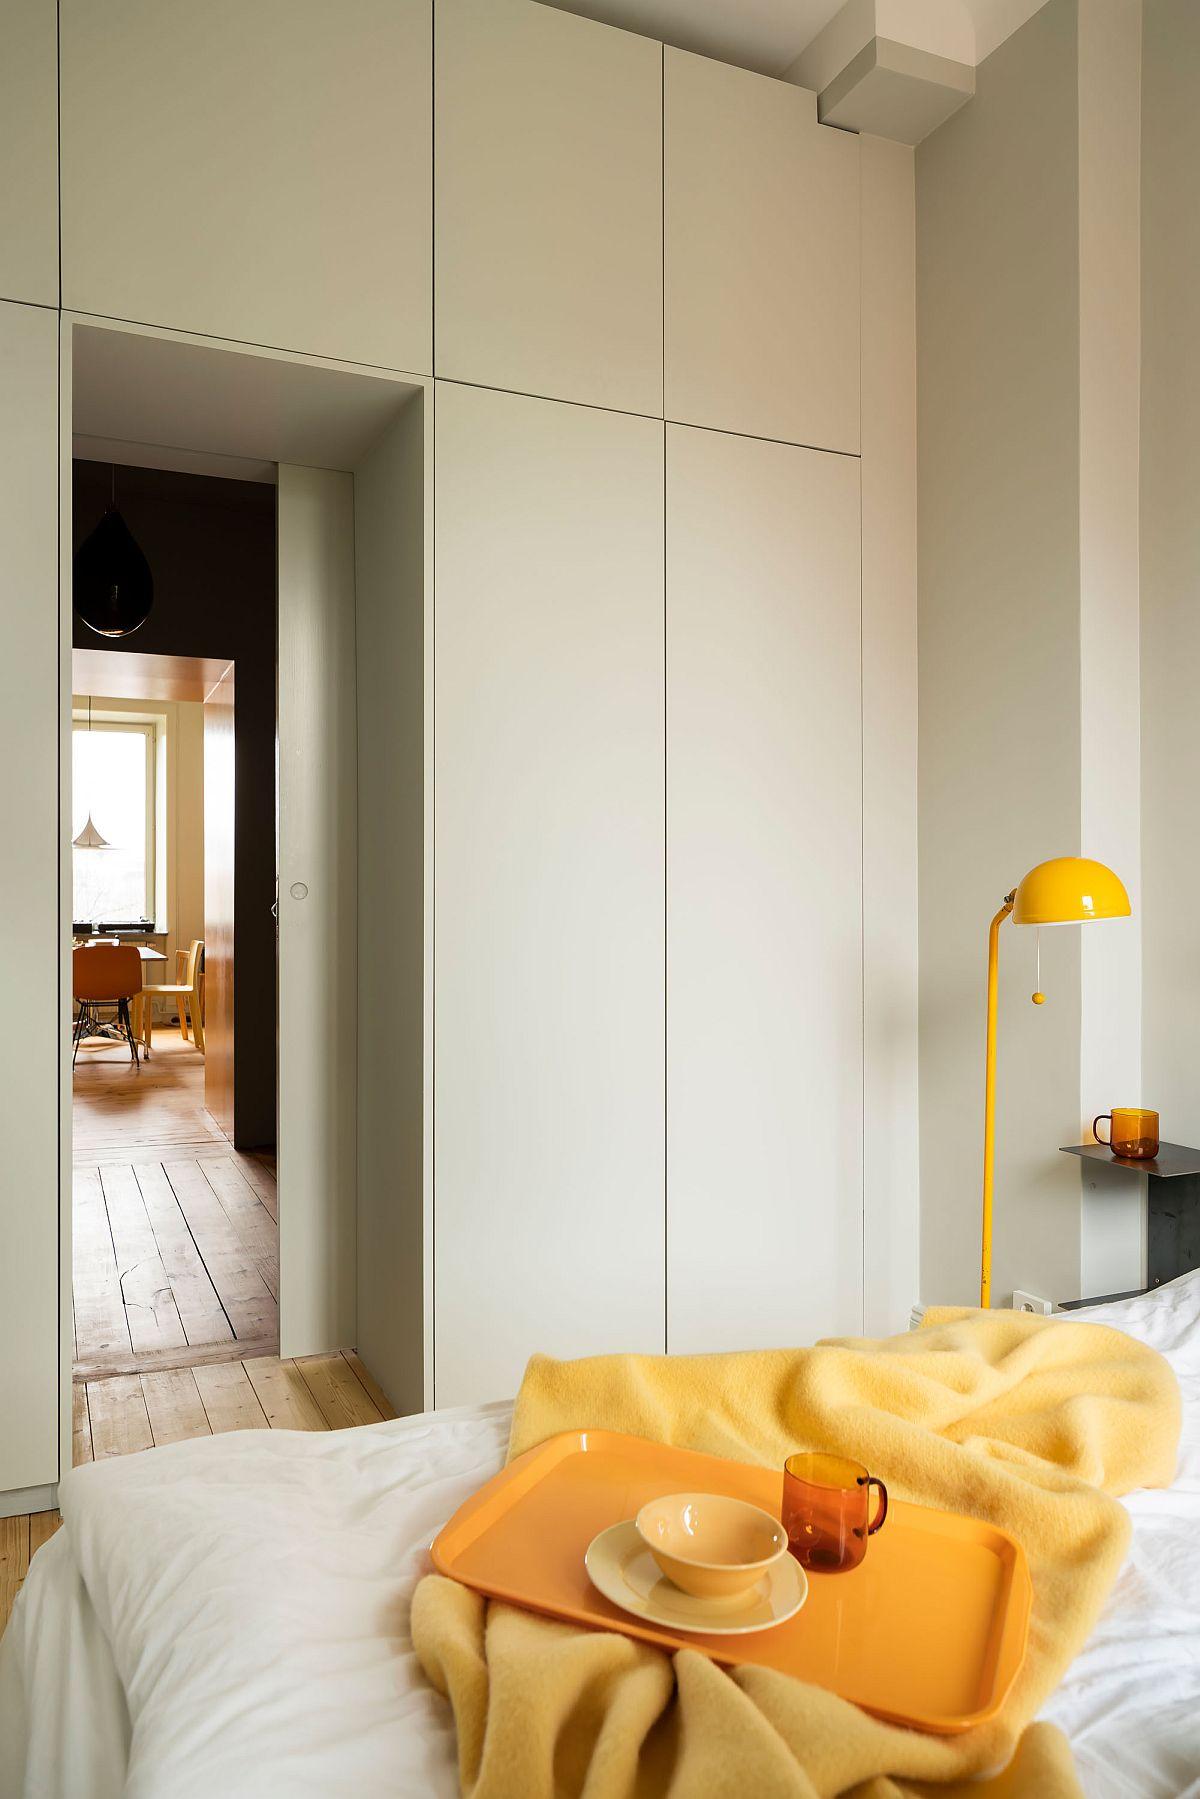 adelaparvu.com despre locuinta 80 mp, Suedia, design arh. David Lookofsky, Foto Mattias Hamren (8)